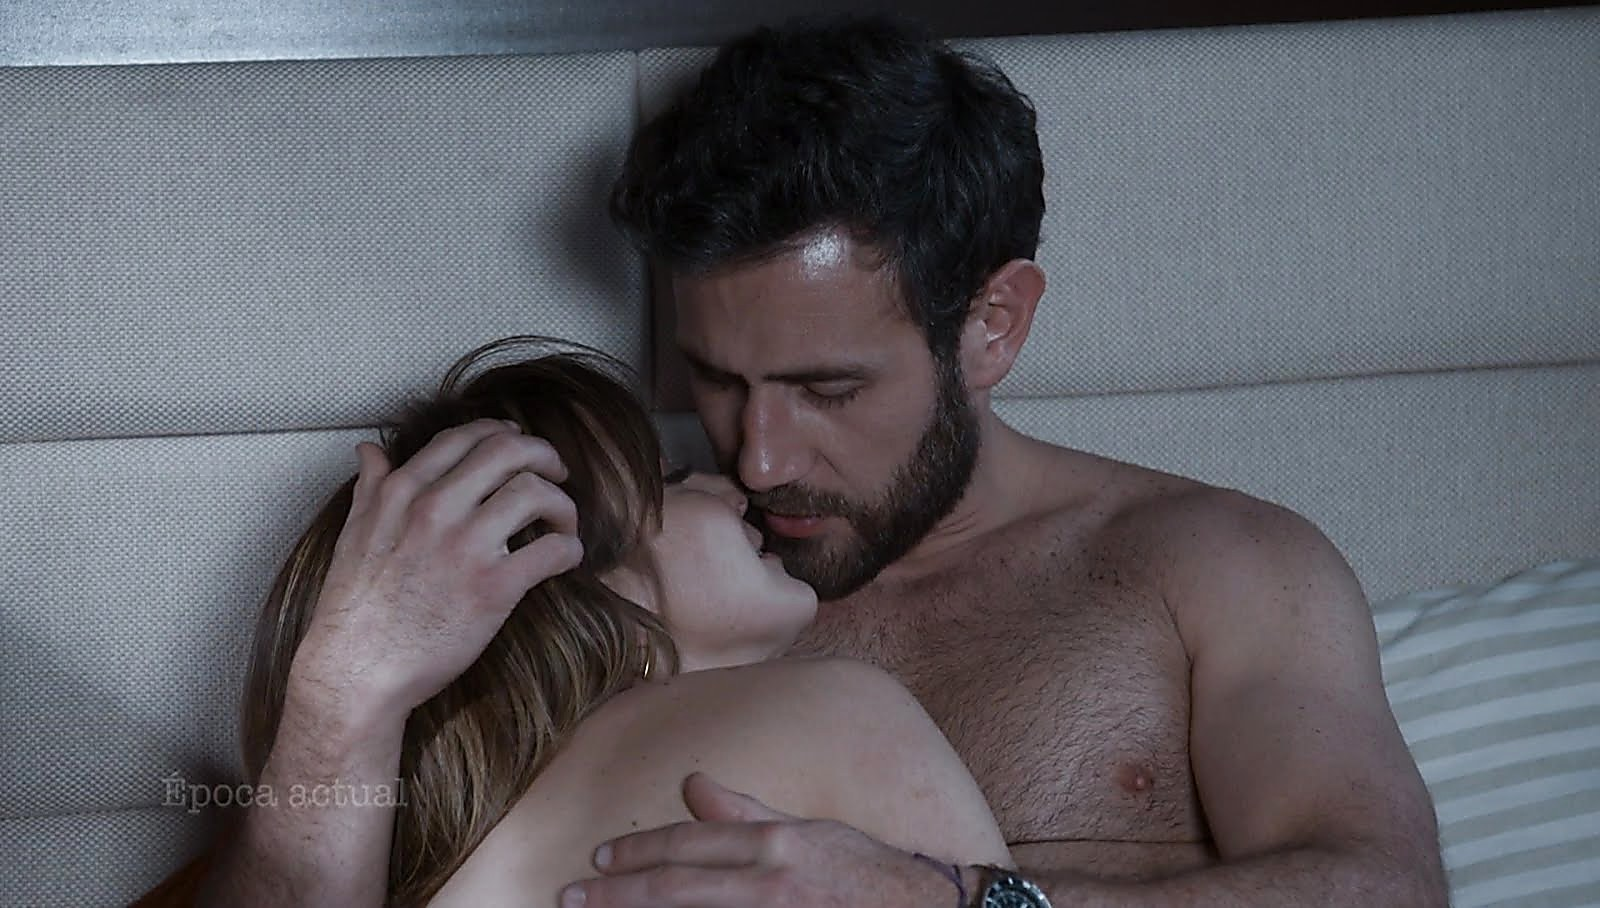 Carlos Ferro sexy shirtless scene March 7, 2018, 1pm